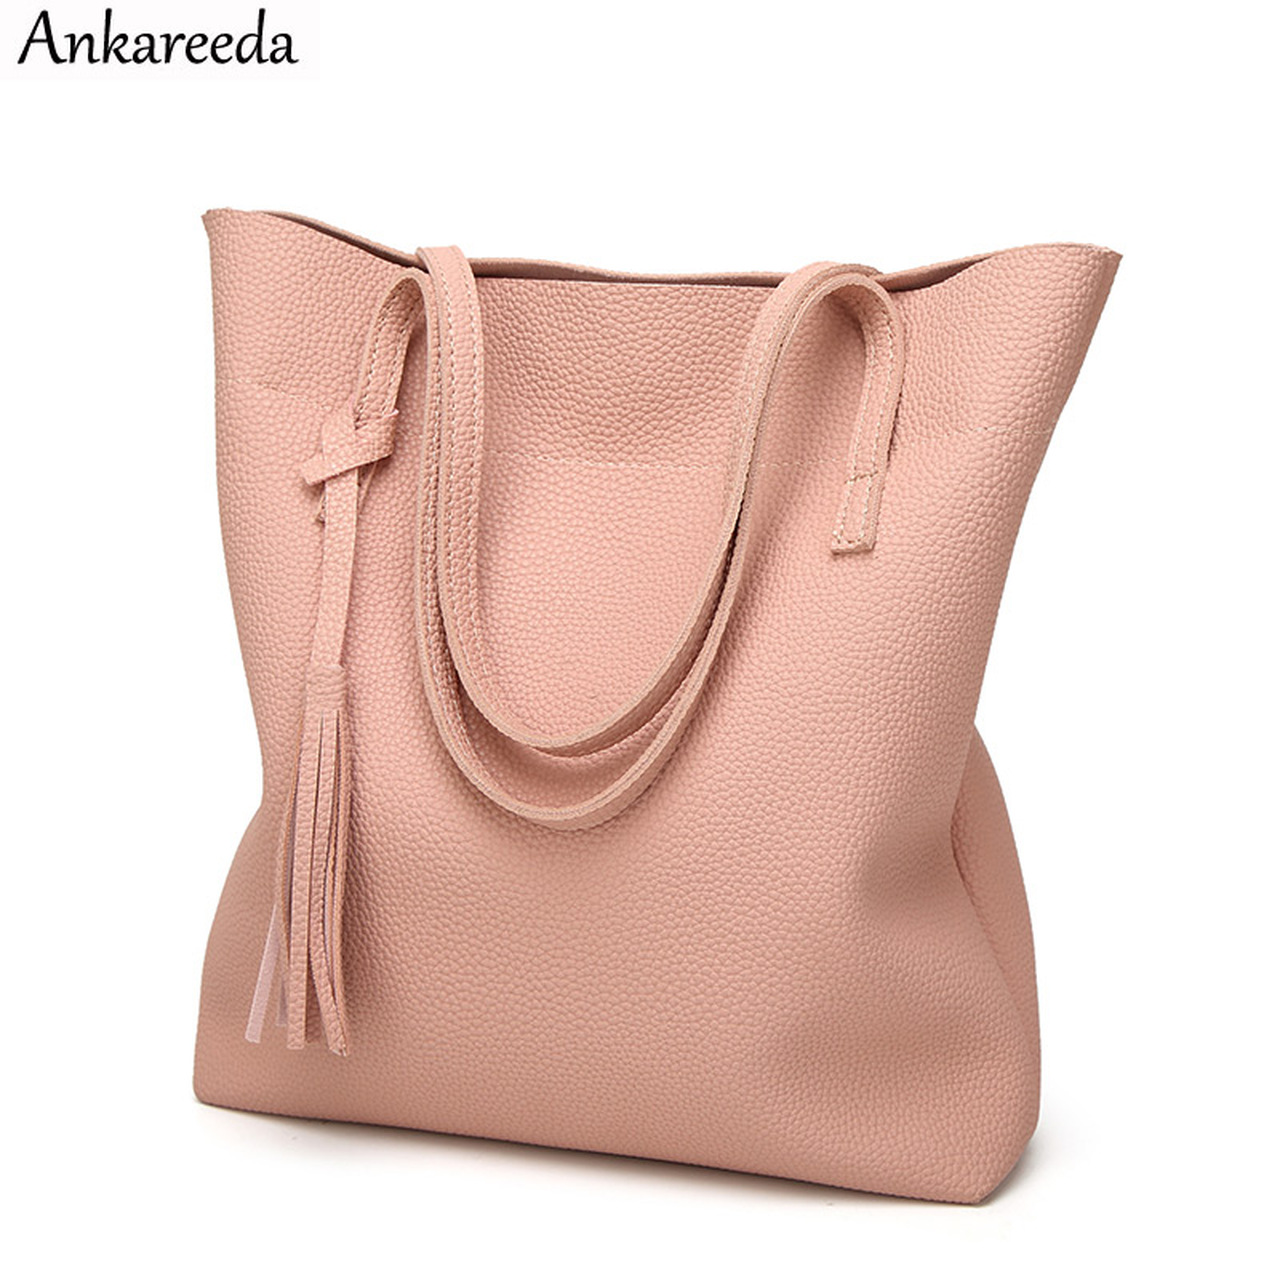 8c5a91da4361 Ankareeda Women's Soft Leather Handbag High Quality Women Shoulder Bag  Luxury Brand Tassel Bucket Bag Fashion Women's Handbags